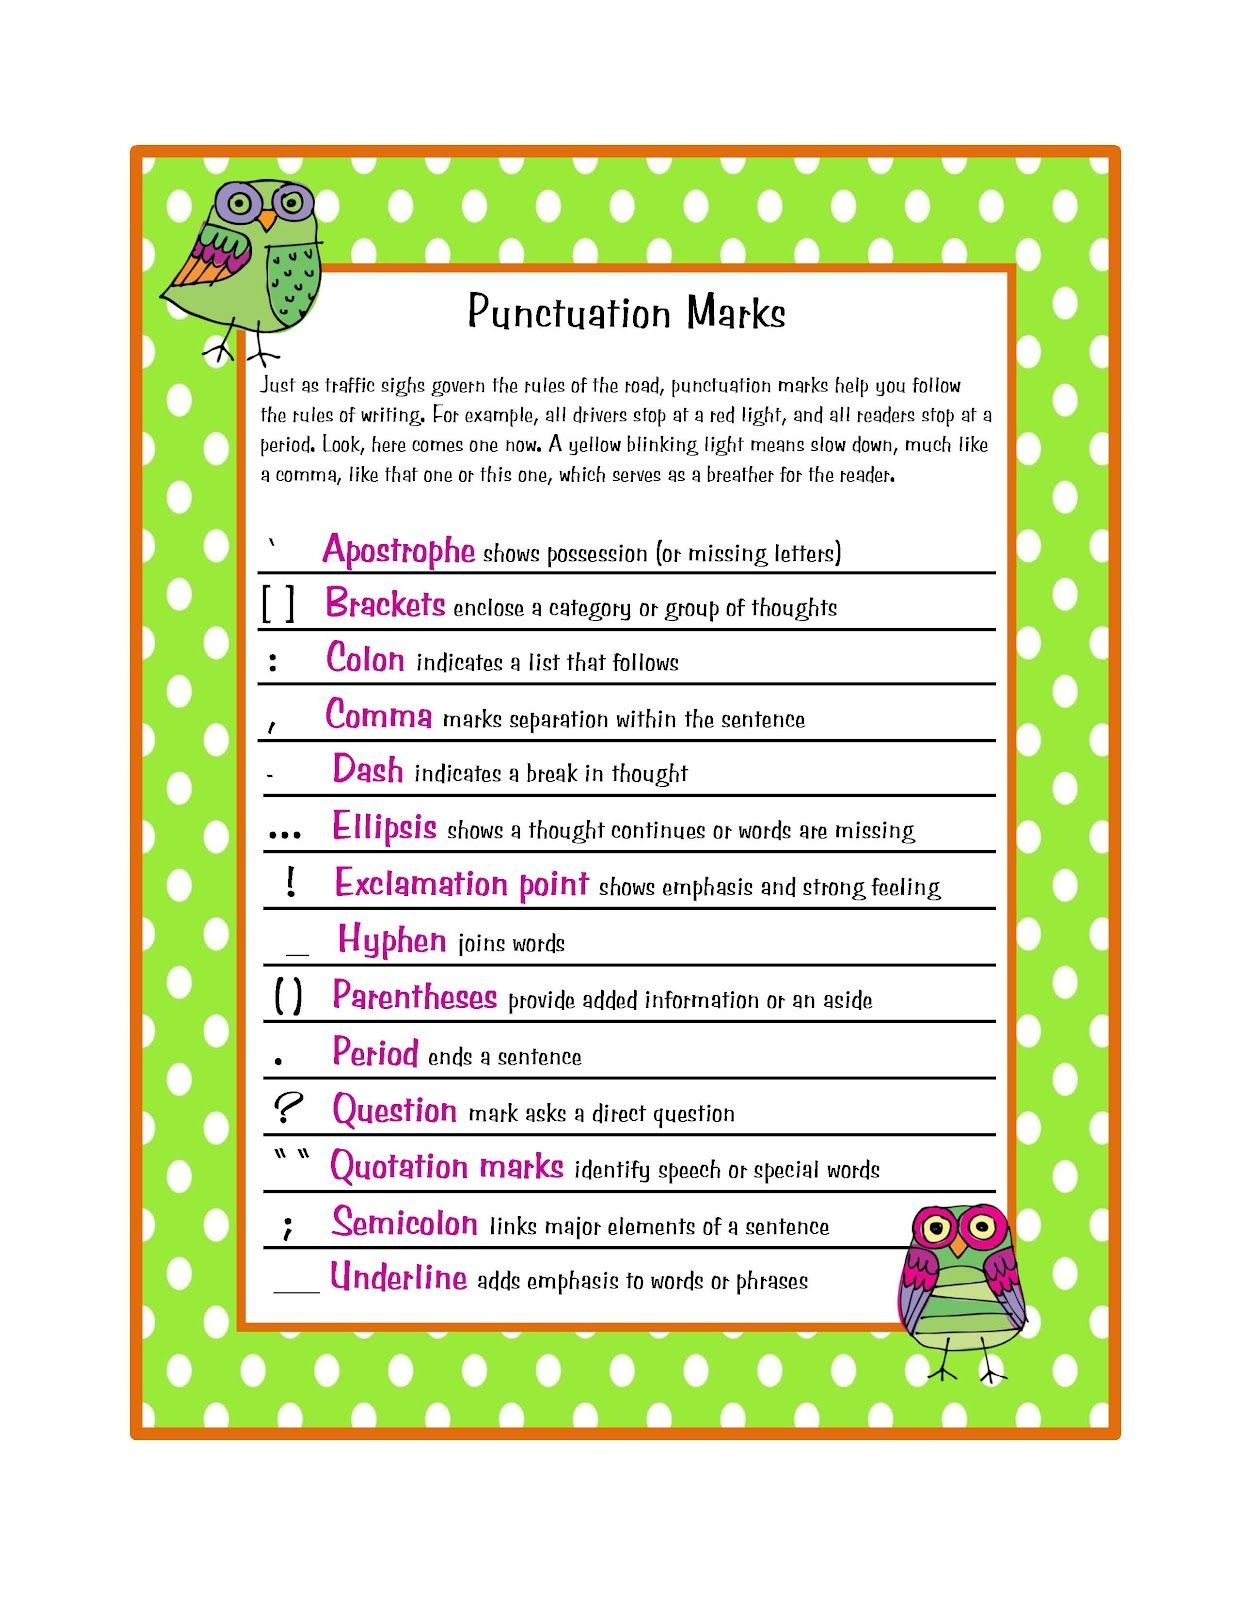 Preschool Printables: Free Parts Of Speech & Punctuation Marks - Punctuation Posters Printable Free